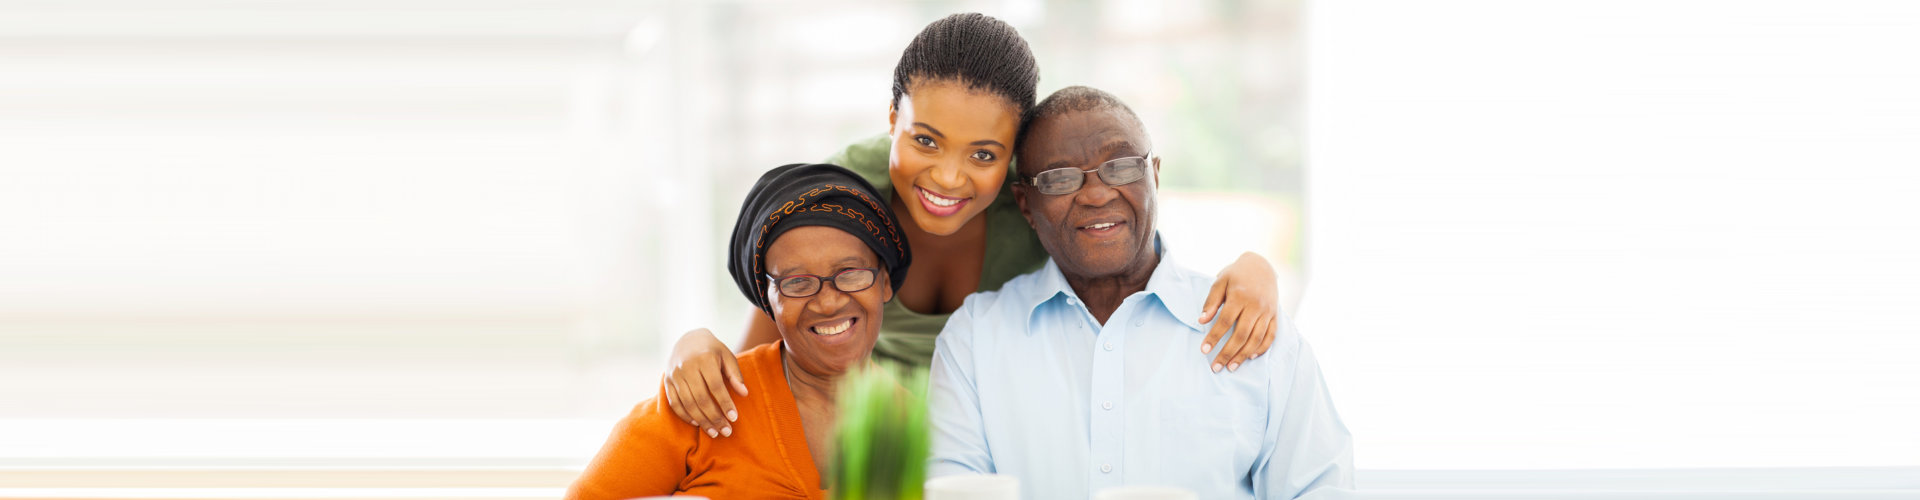 caregiver and senior couple